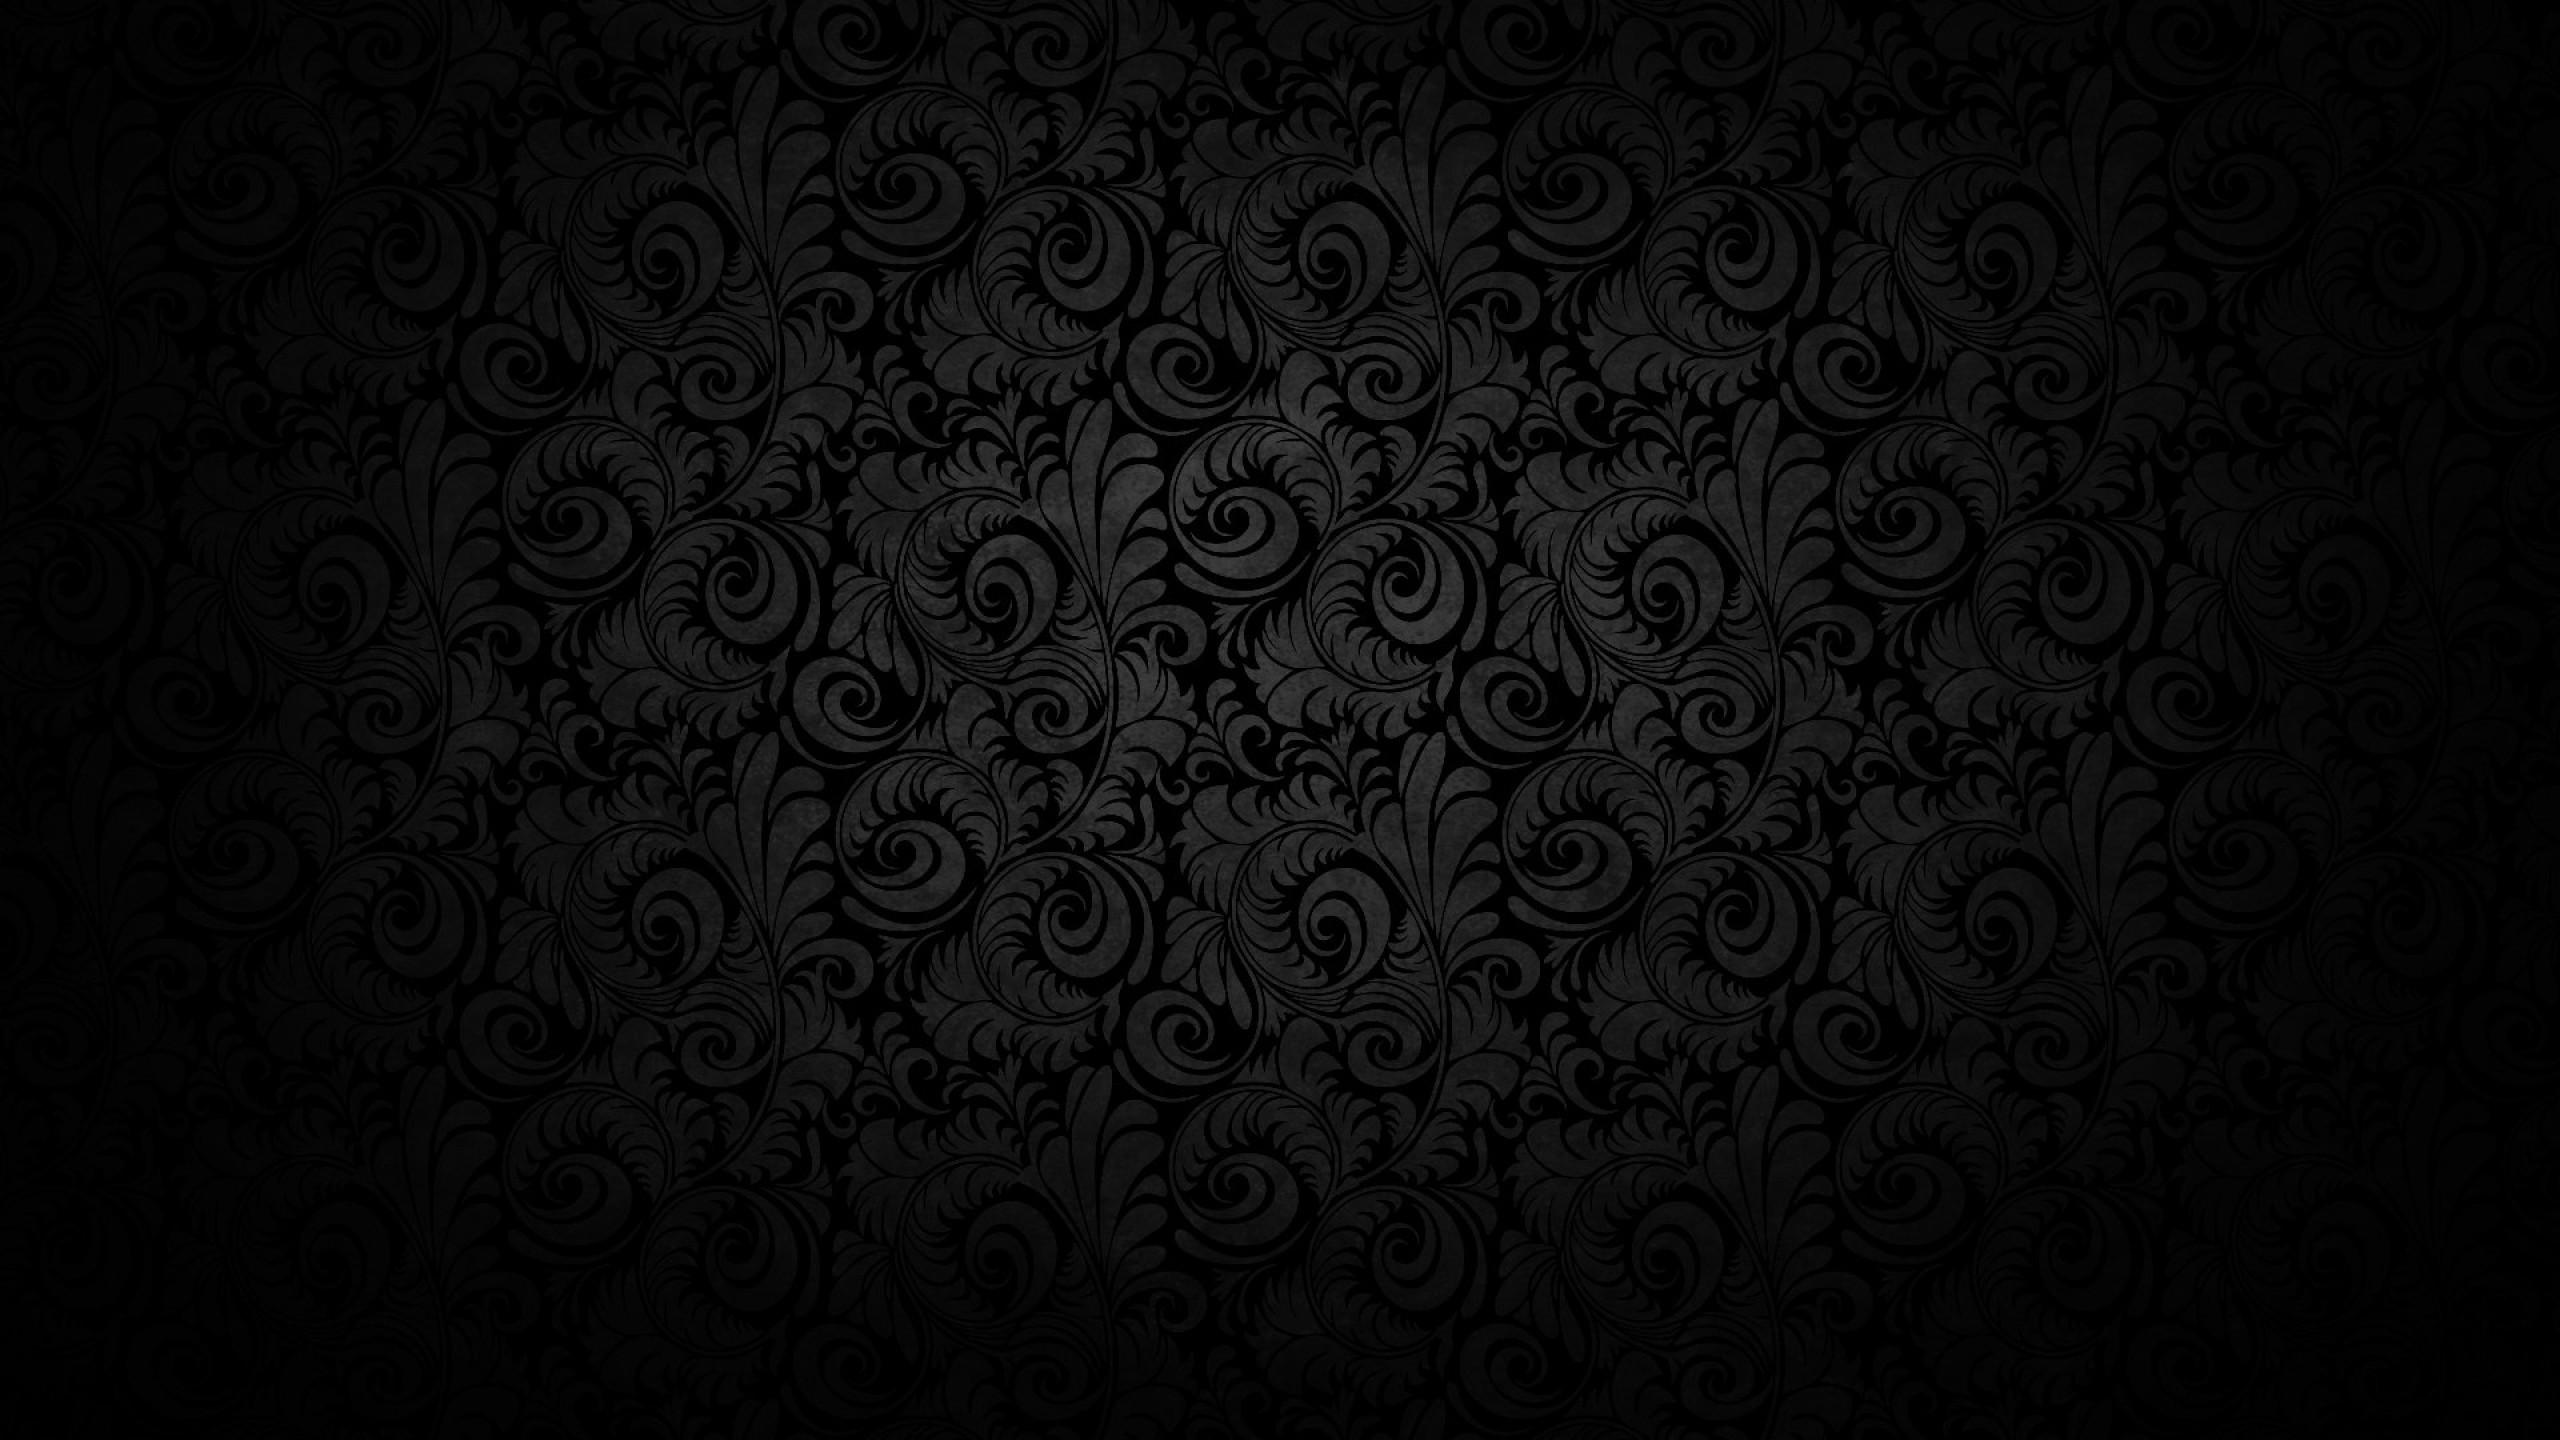 2560 X 1440 Wallpaper Black 94 Images